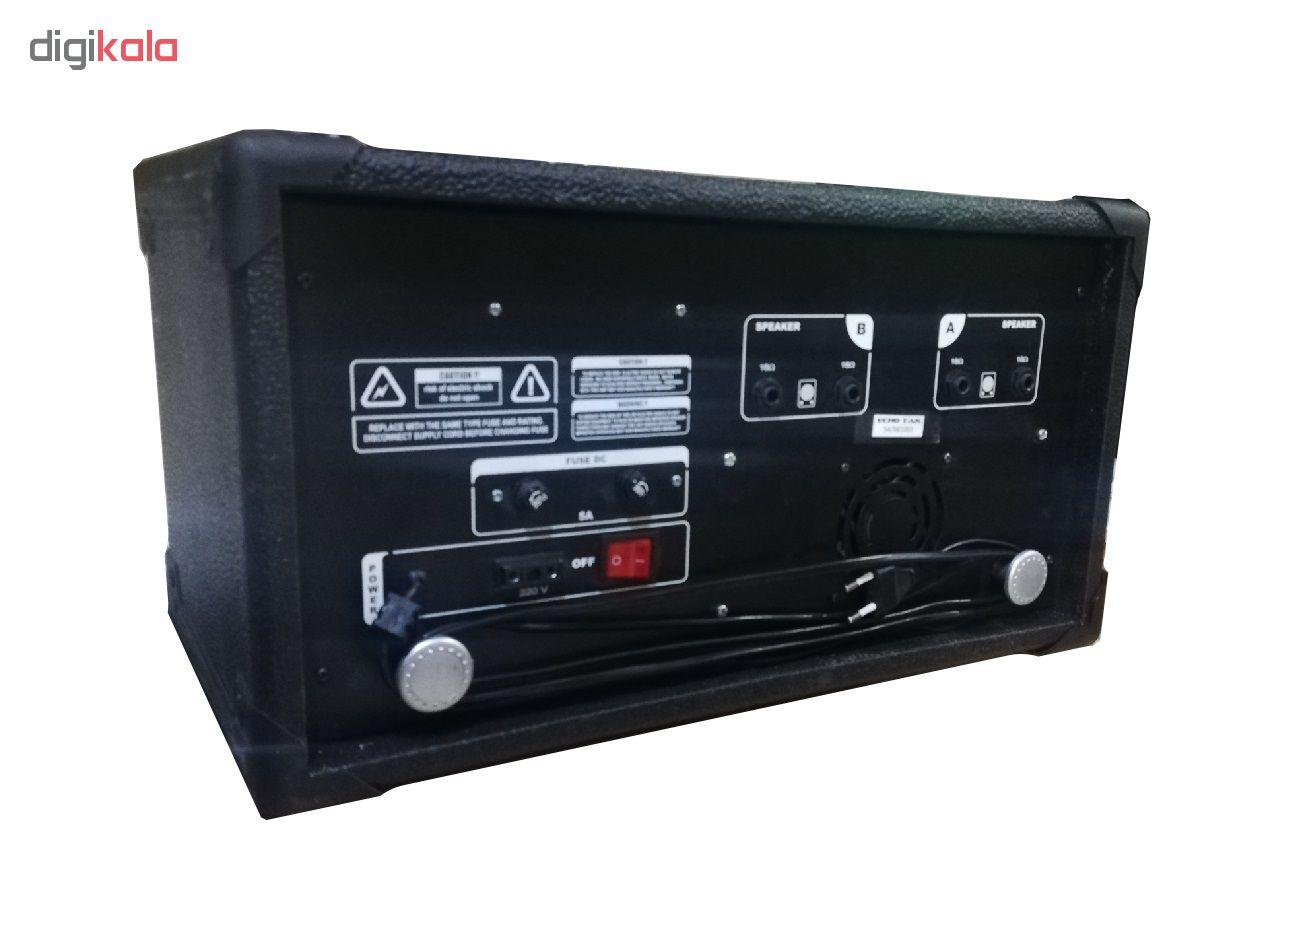 اکو آمپلی فایر اکوتک مدل 5420